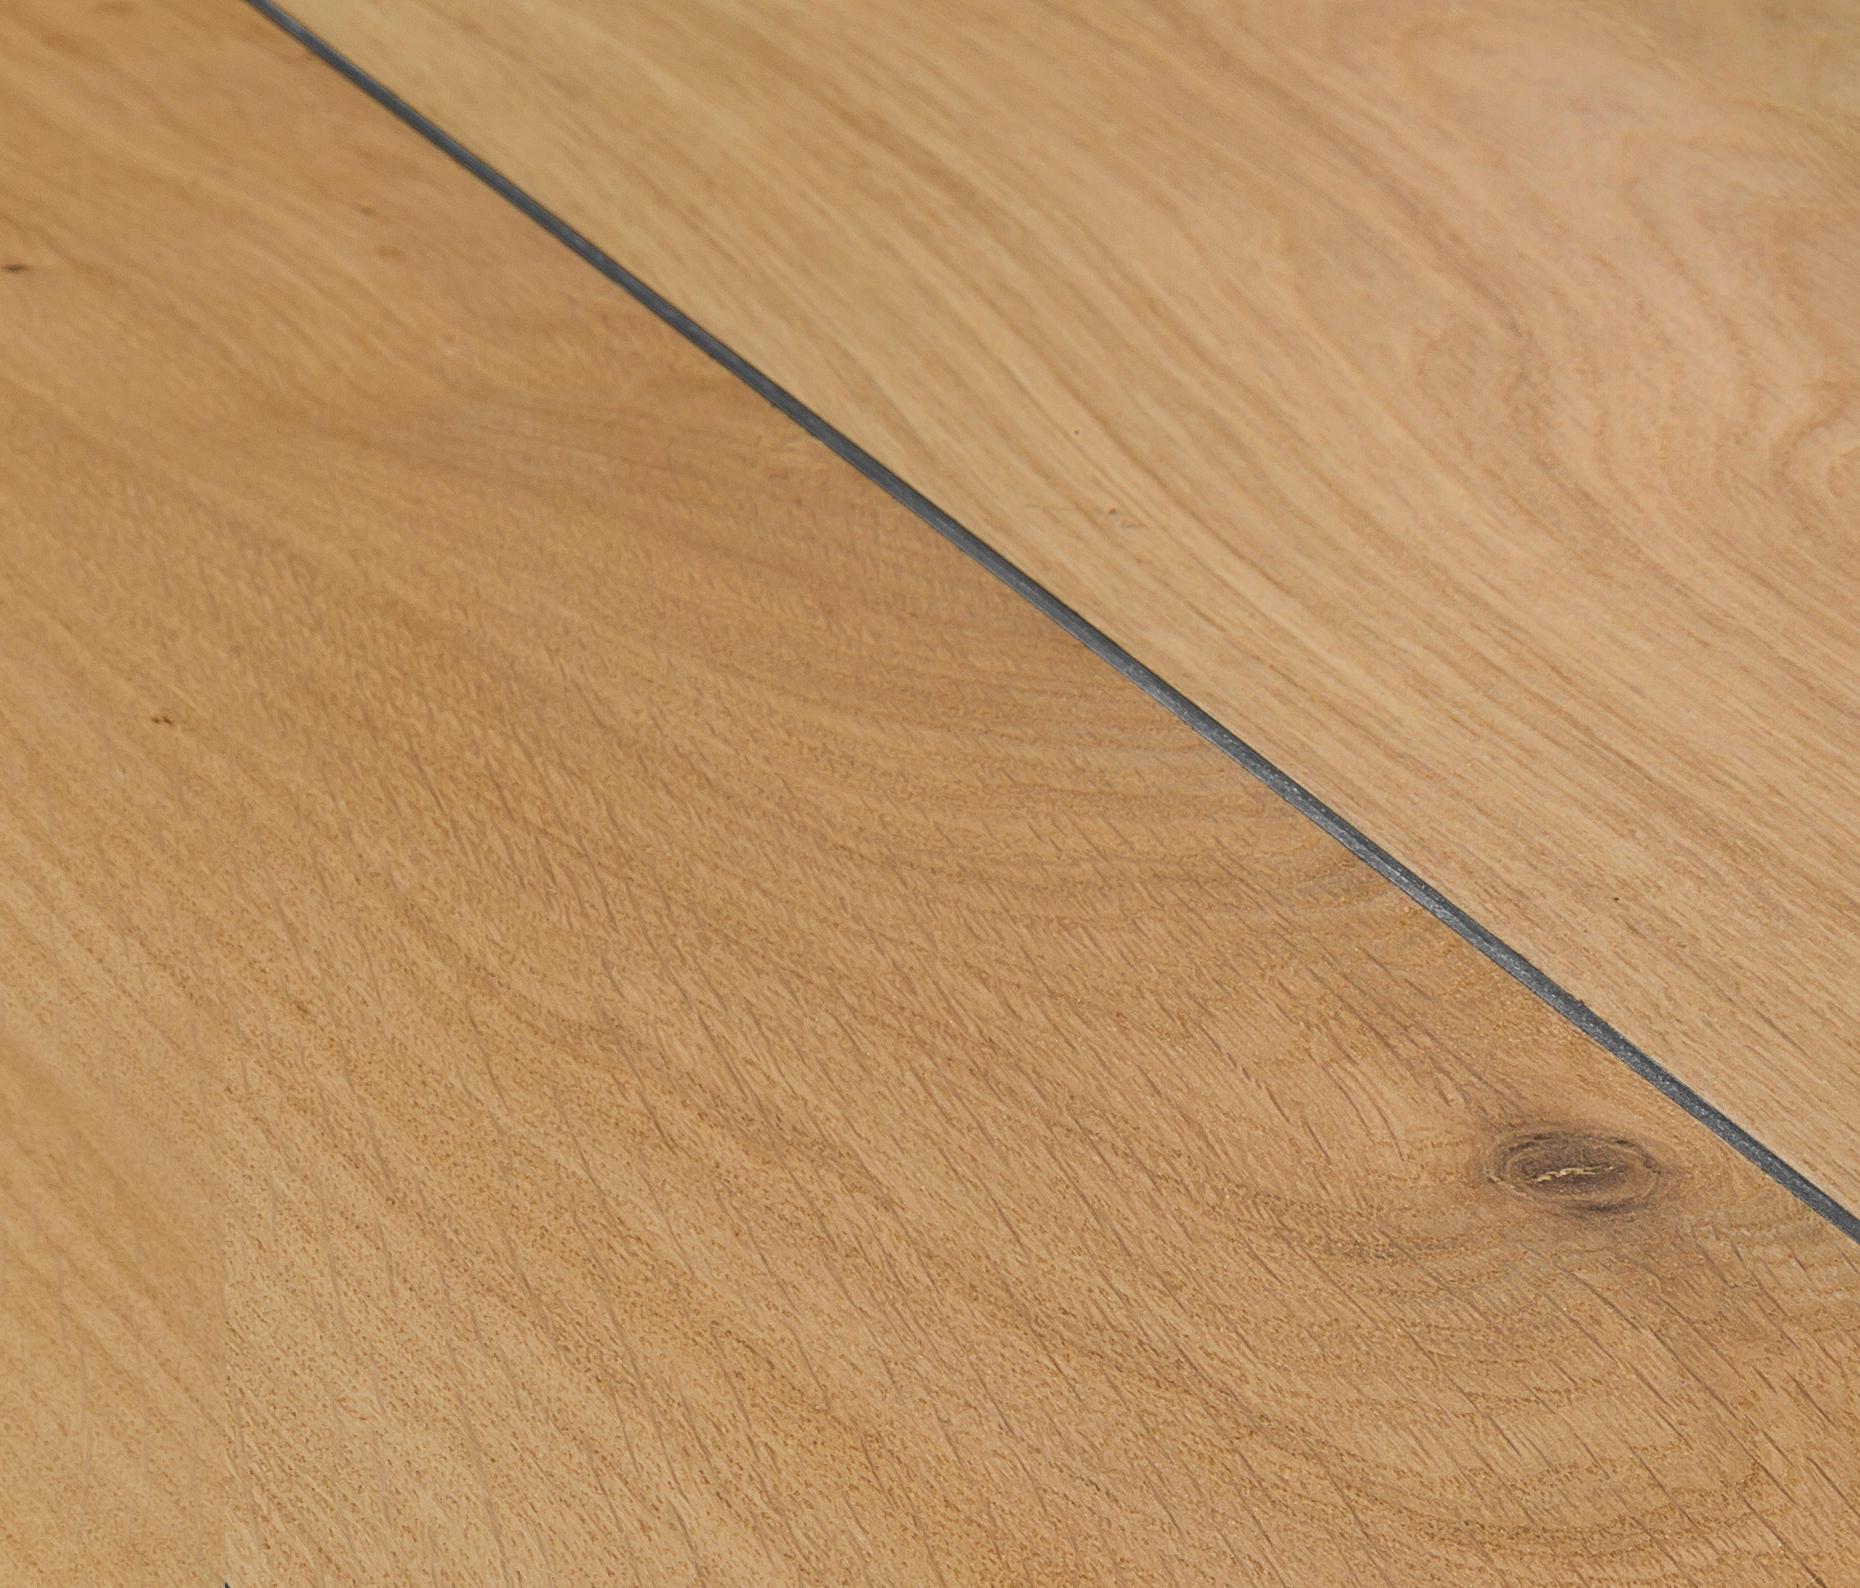 Hydro Parquet Nature By Hüma Wood Flooring